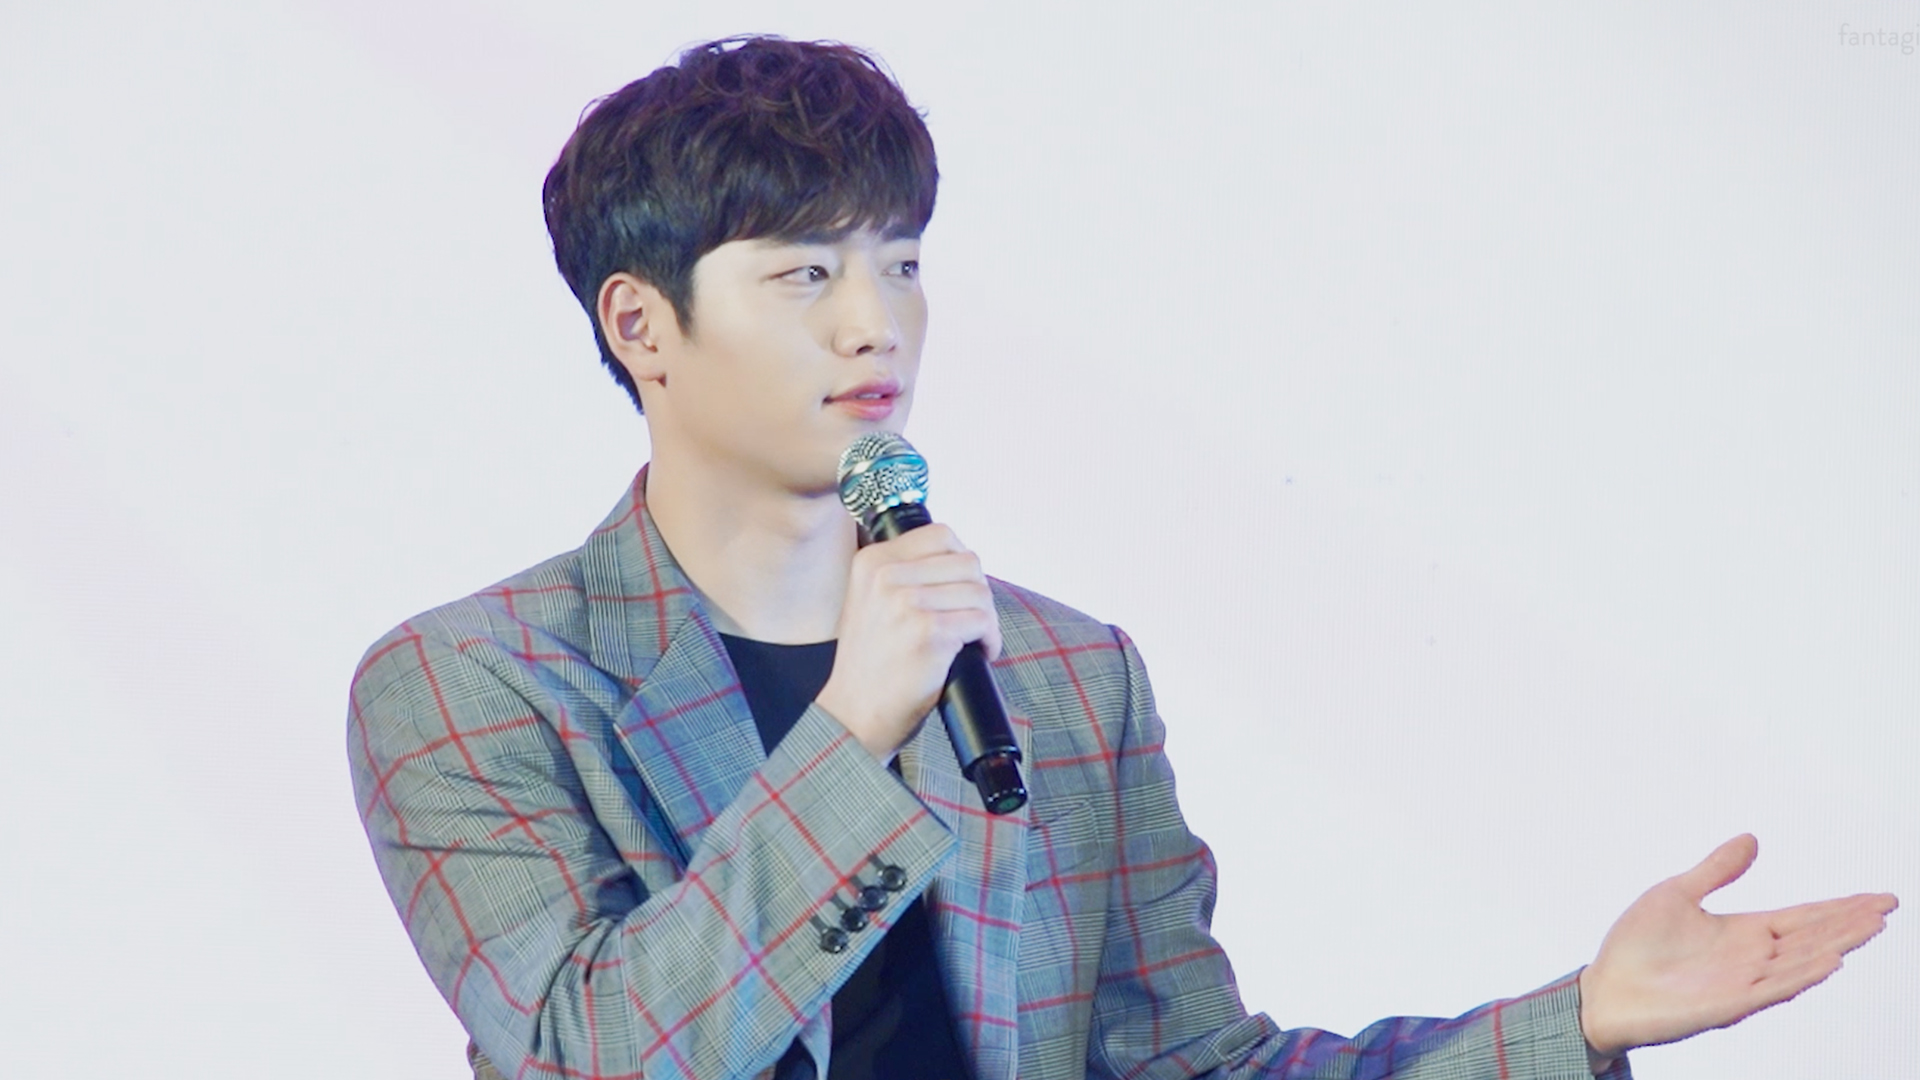 SEO KANG JUN 서강준 - 2019  태국 단독 팬미팅 비하인드